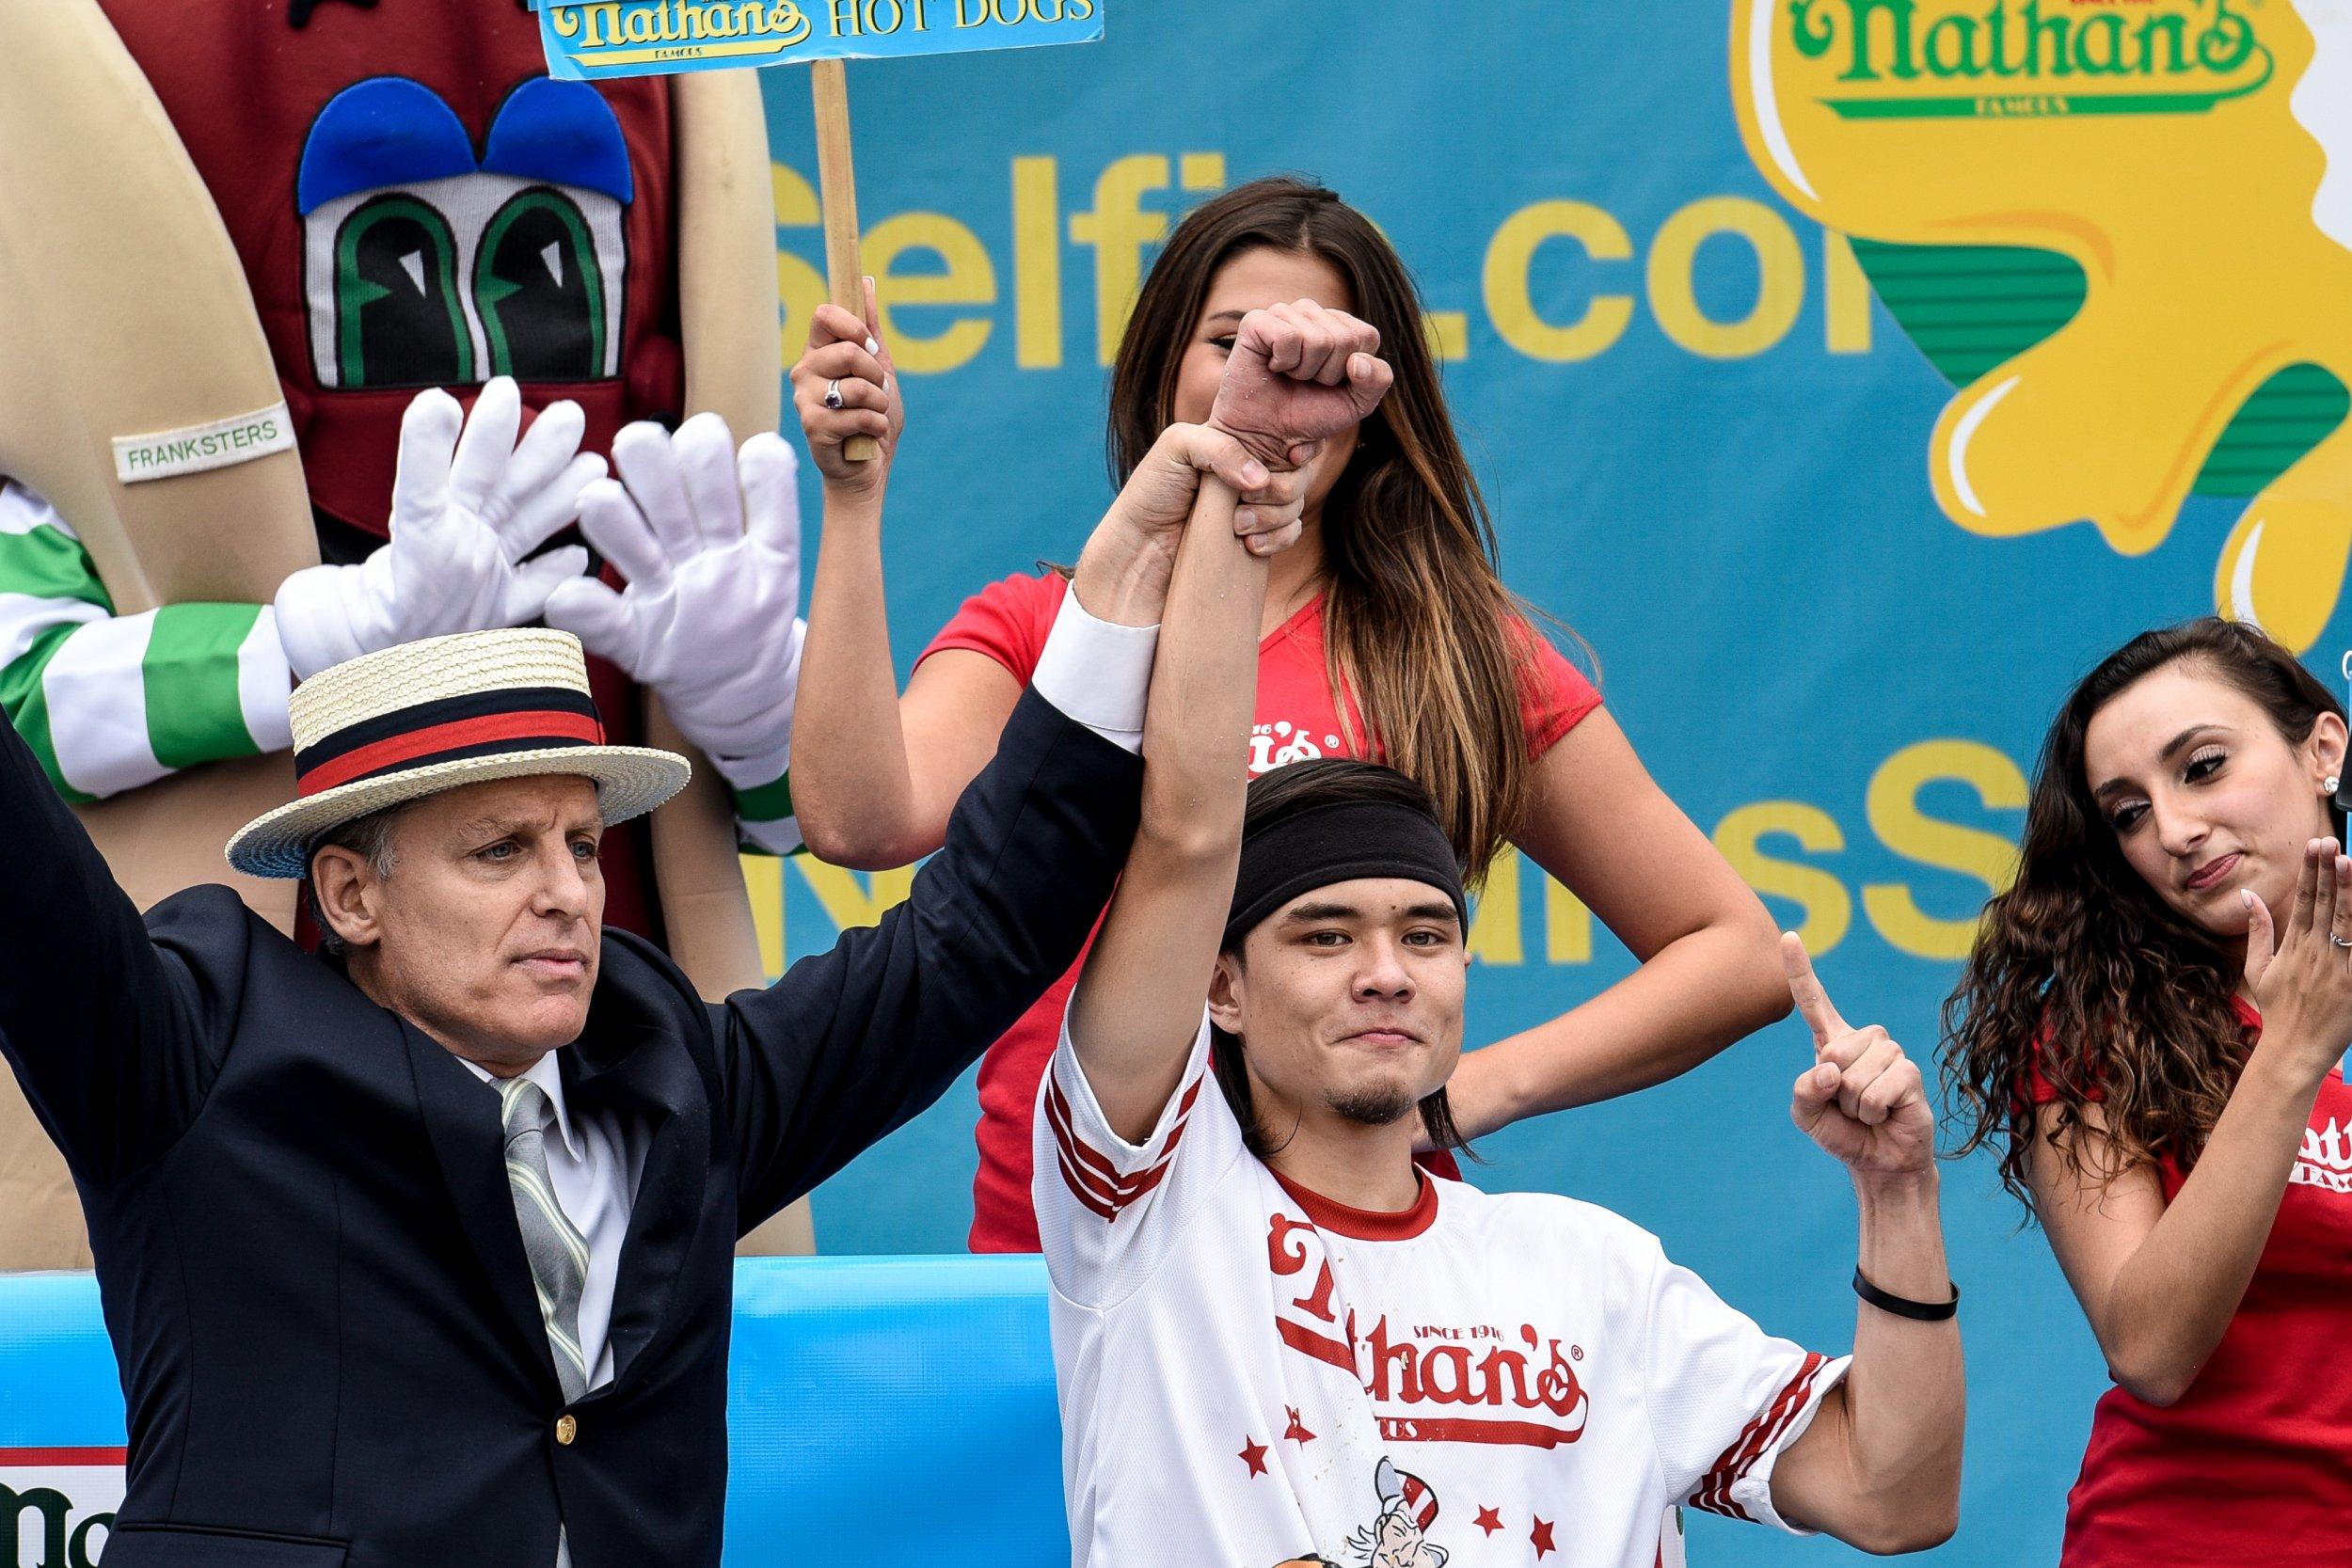 Matt Stonie, center, in Coney Island, New York, July 4 2015.